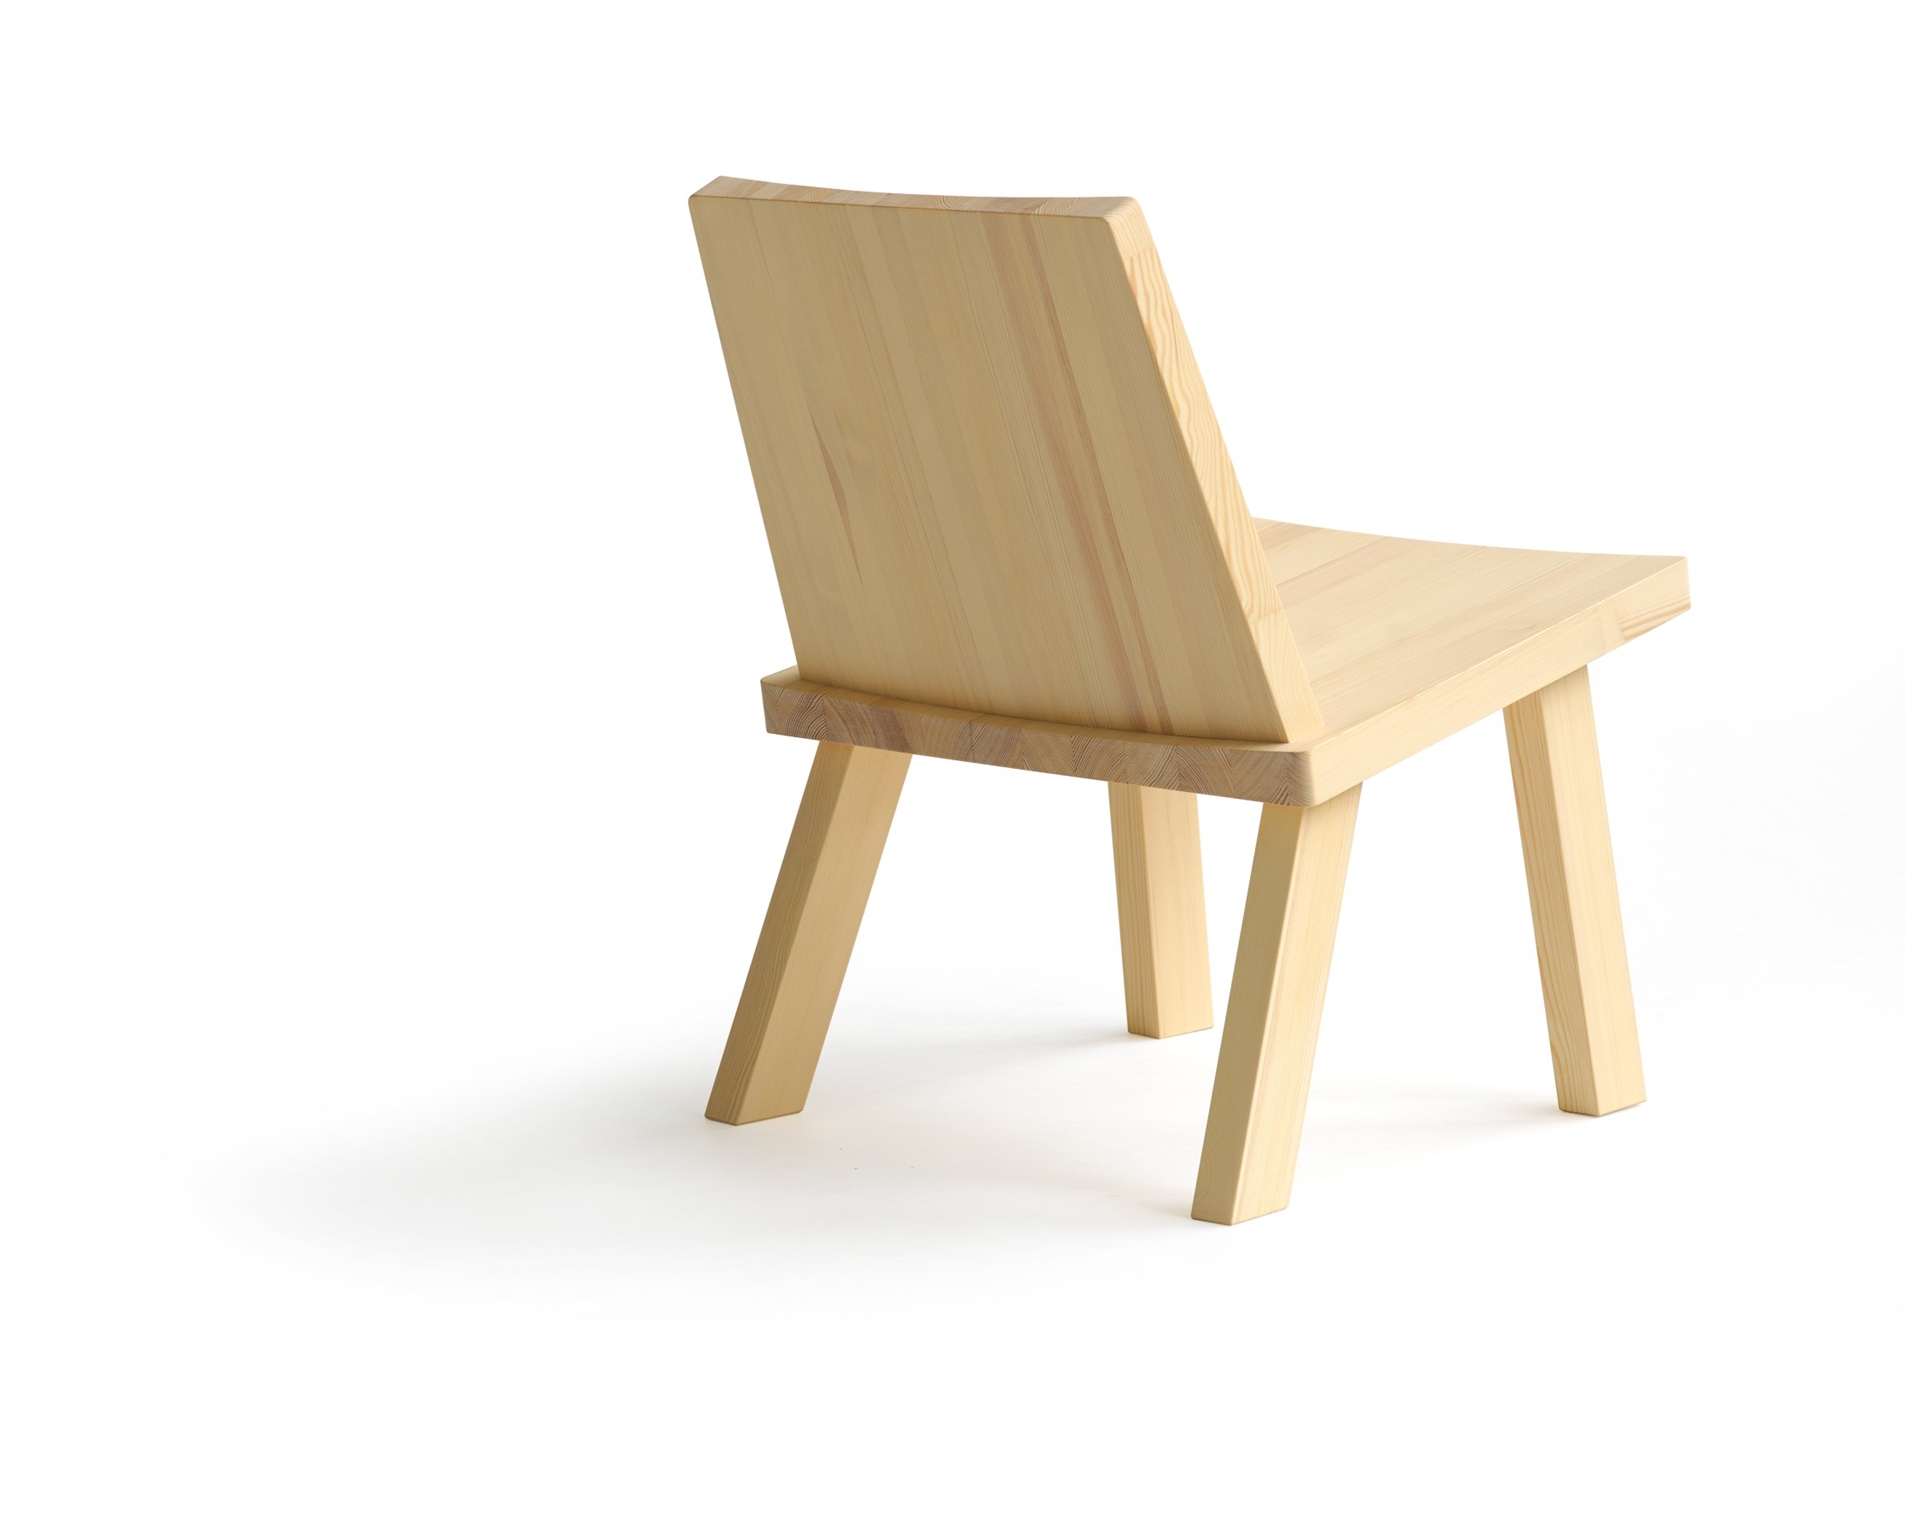 Stupendous Products Bla Station Inzonedesignstudio Interior Chair Design Inzonedesignstudiocom